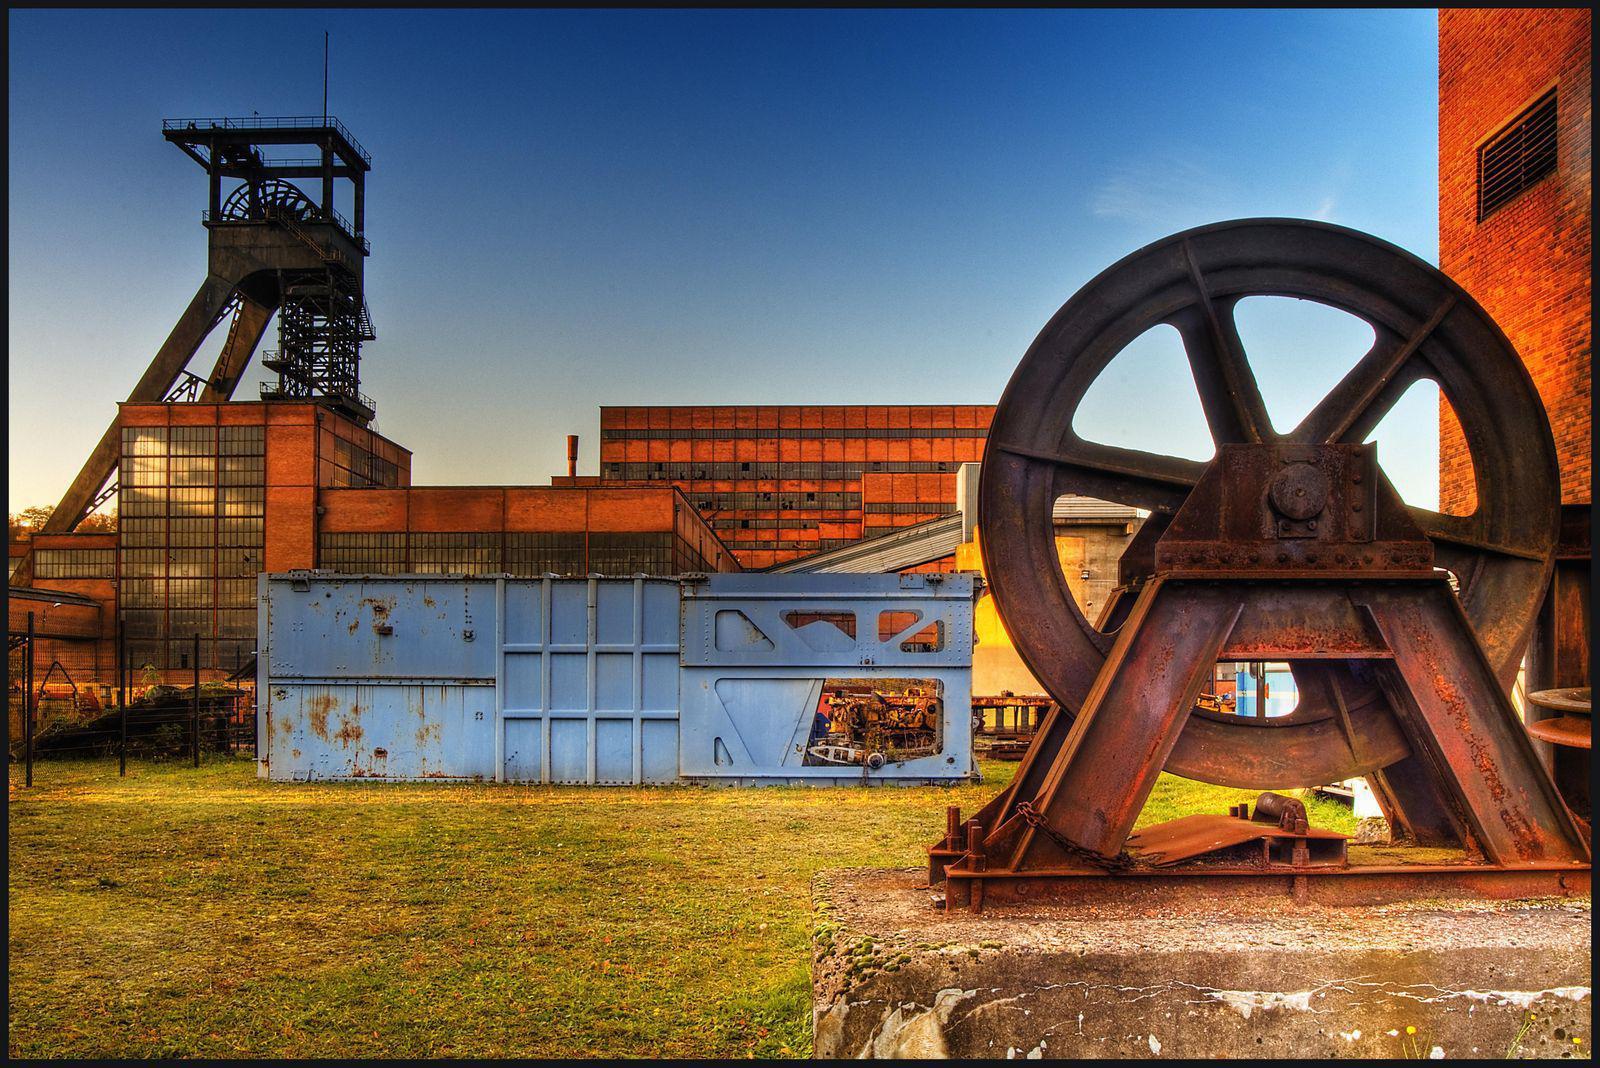 Musée Mine, Carreau Wendel_Petite-Rosselle (1)